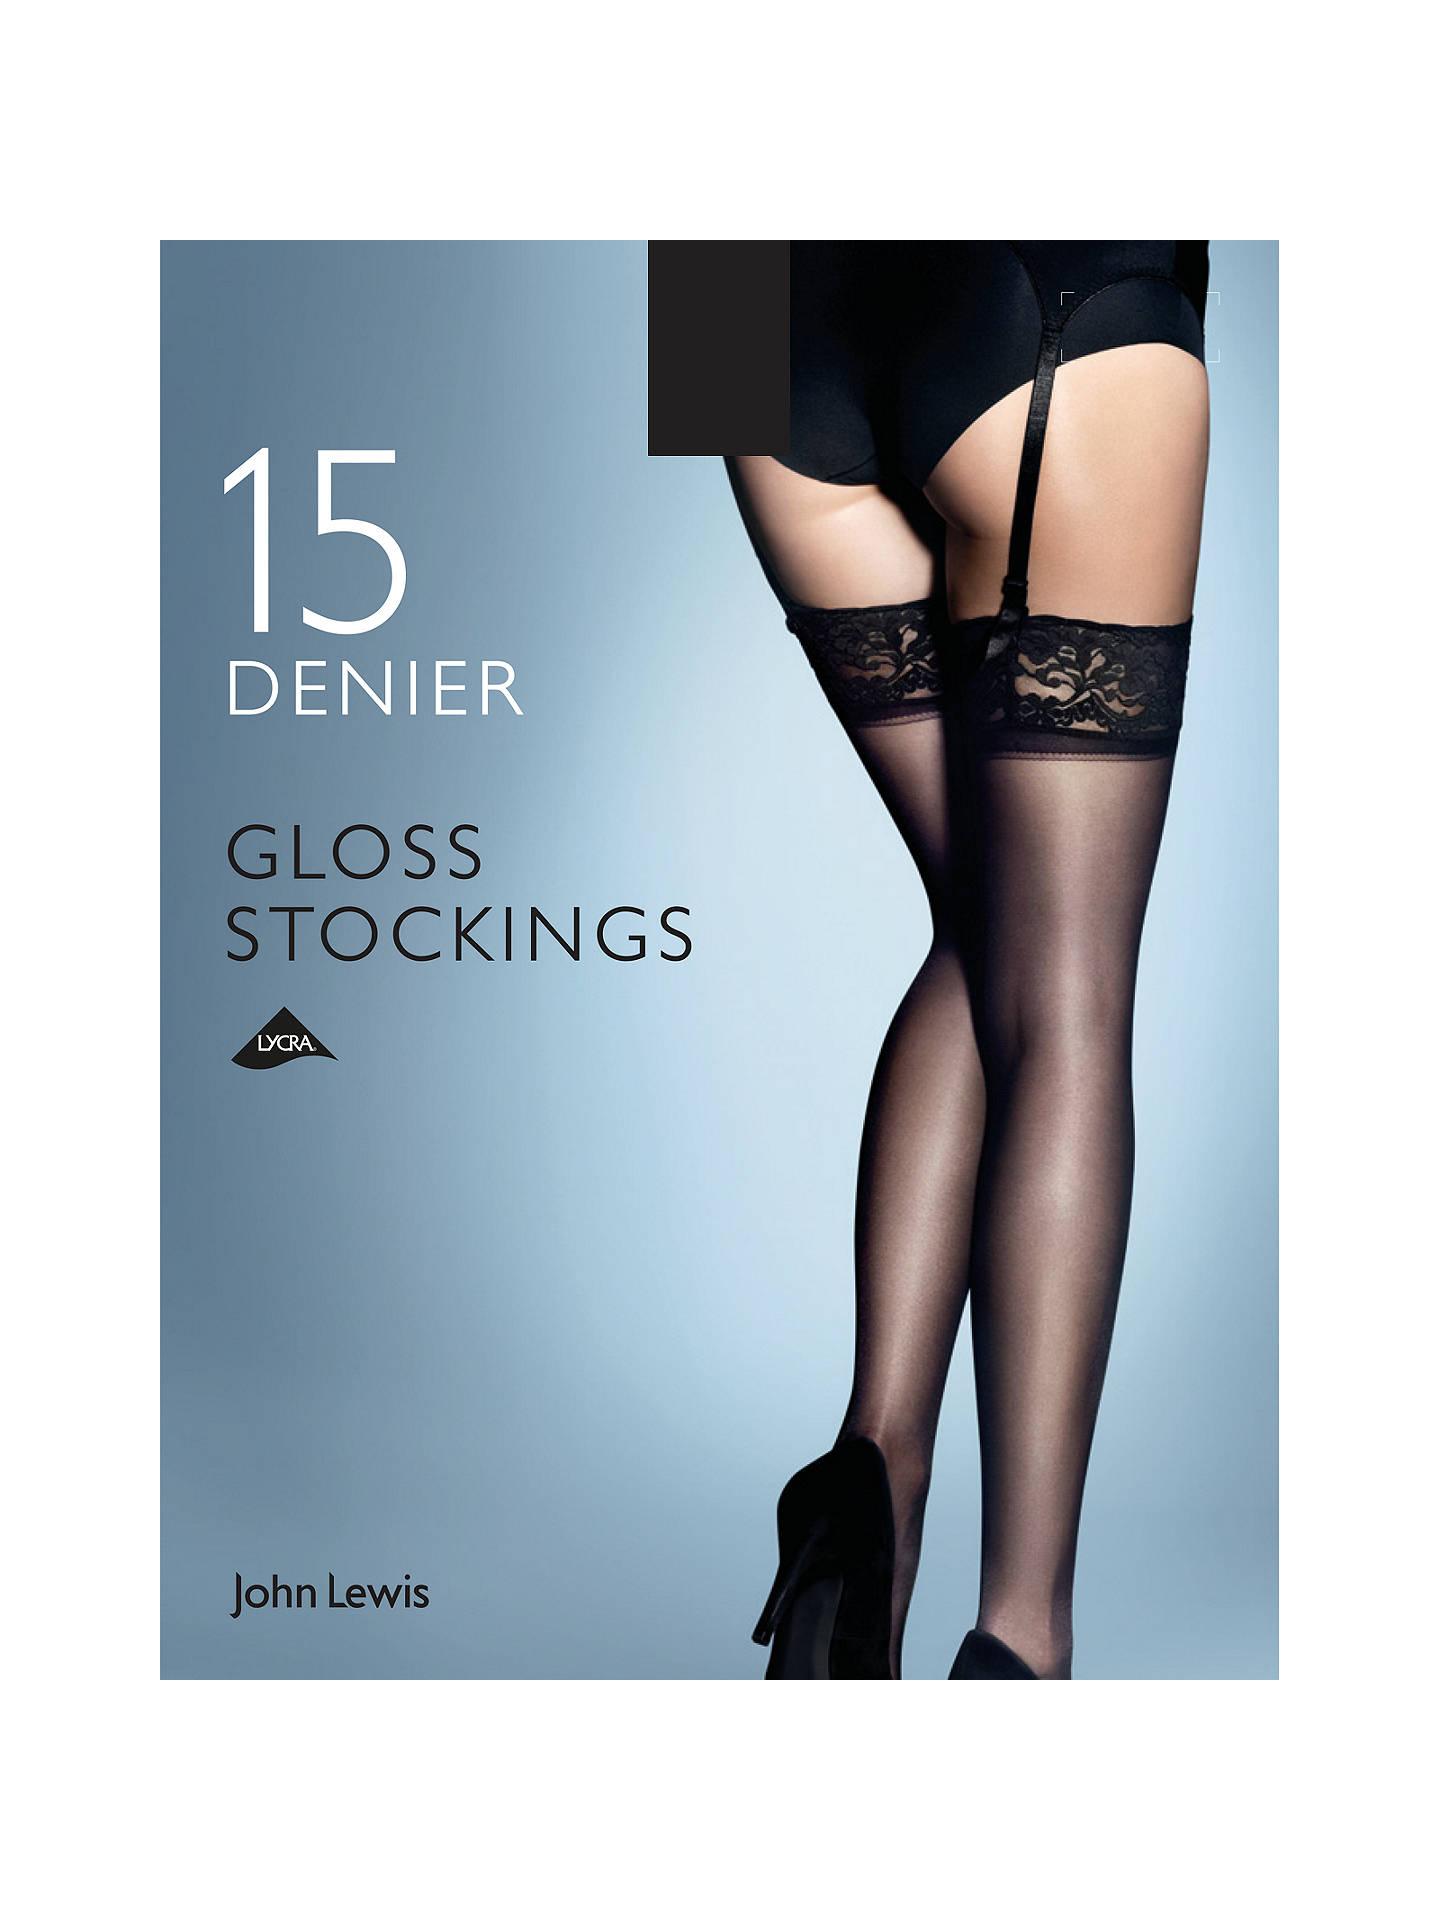 814888af2 Buy John Lewis   Partners 15 Denier Gloss Stockings